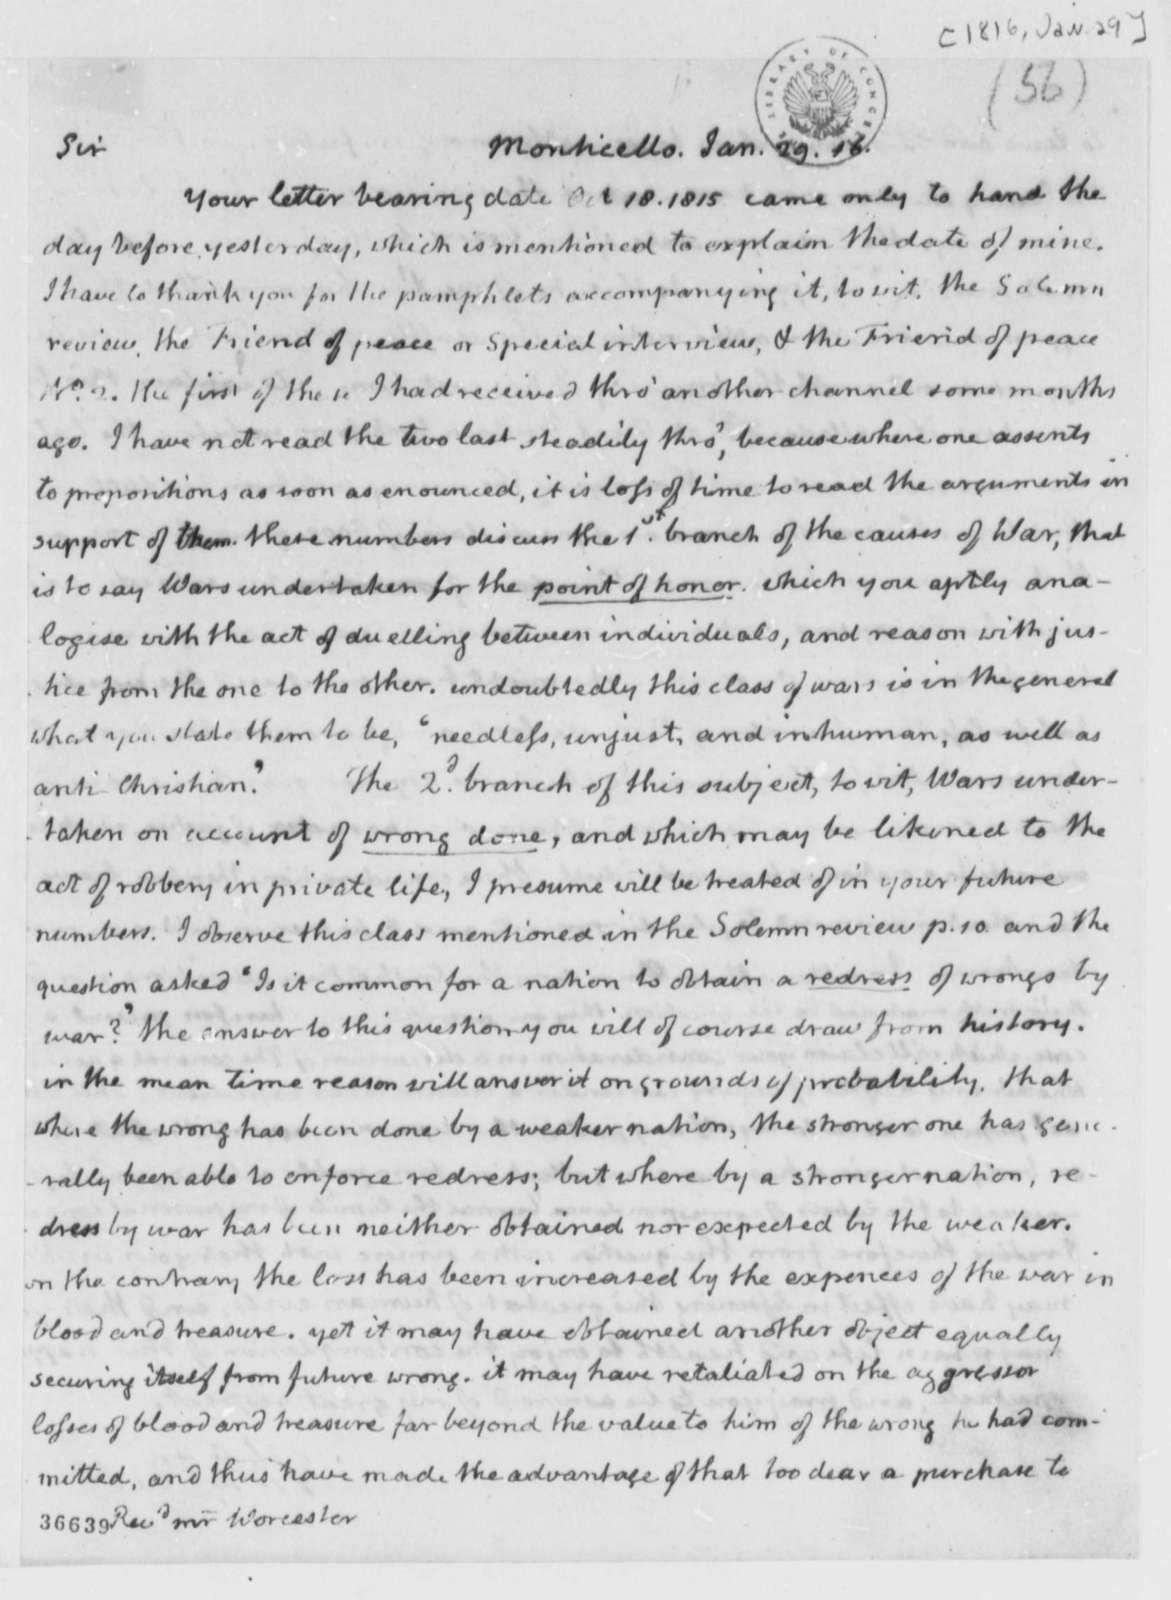 Thomas Jefferson to Noah Worcester, January 29, 1816